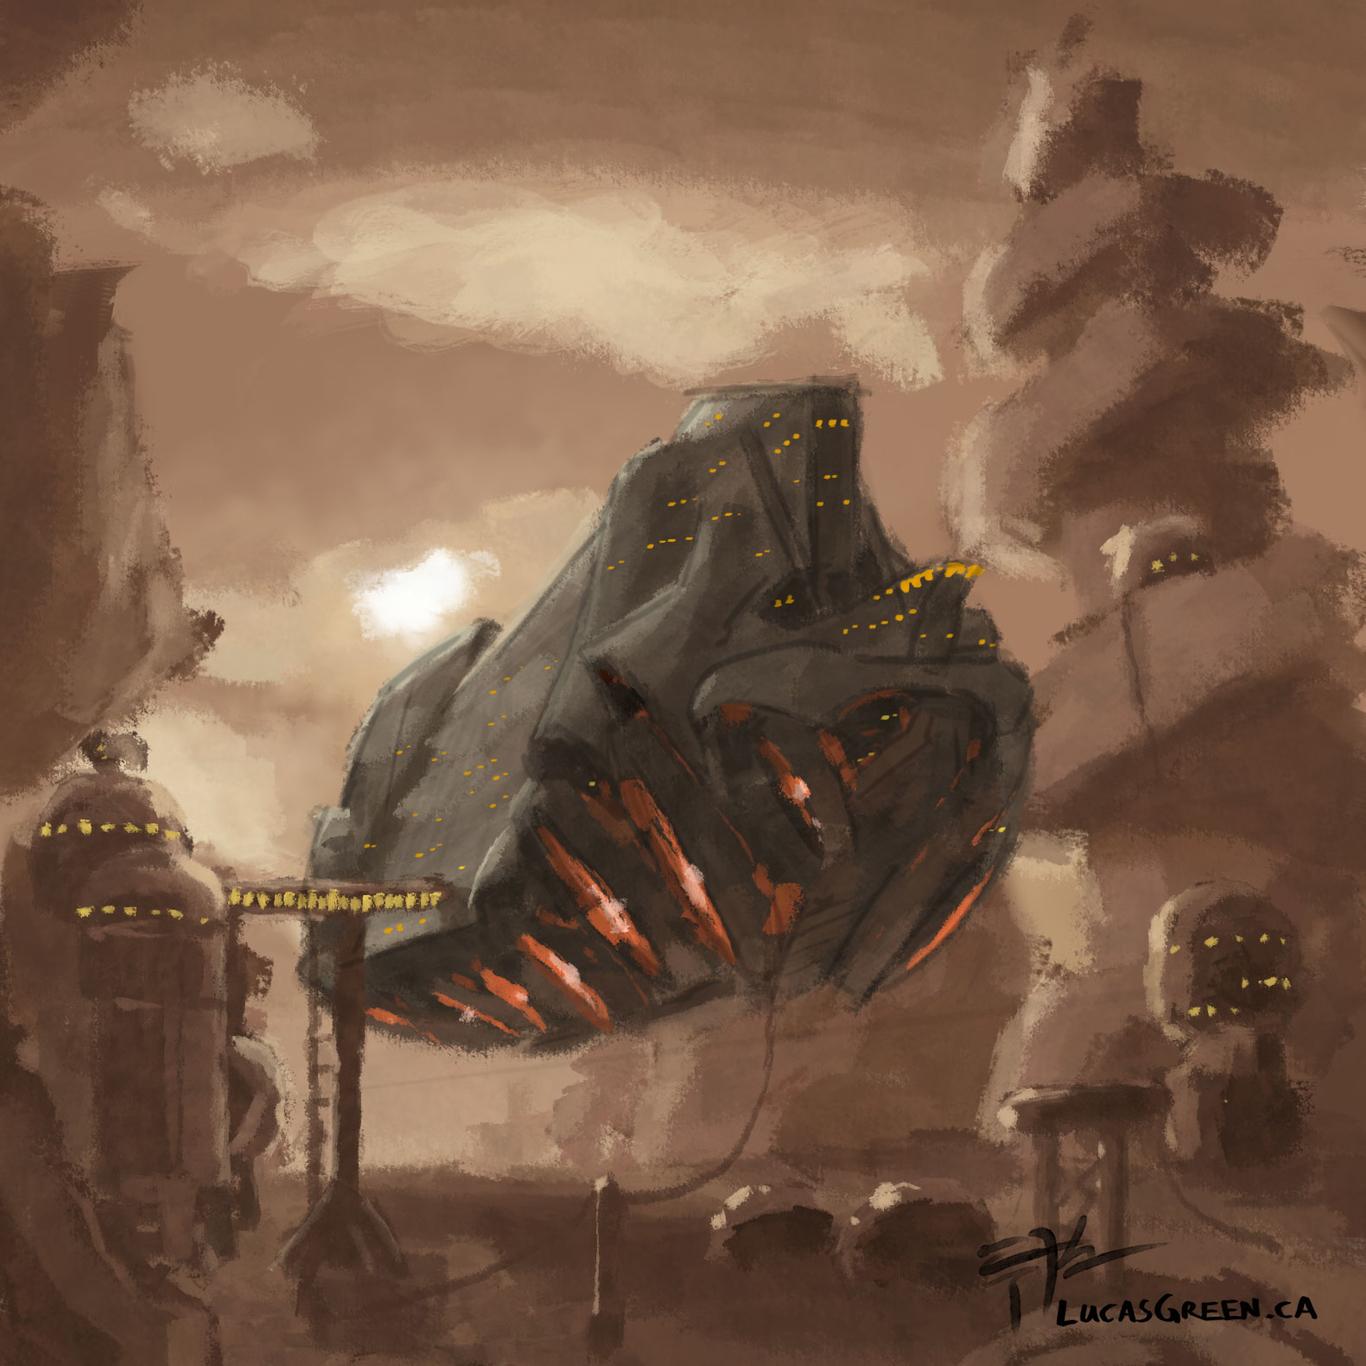 Lucasgreen planetfall 1 43243bcb 0c45